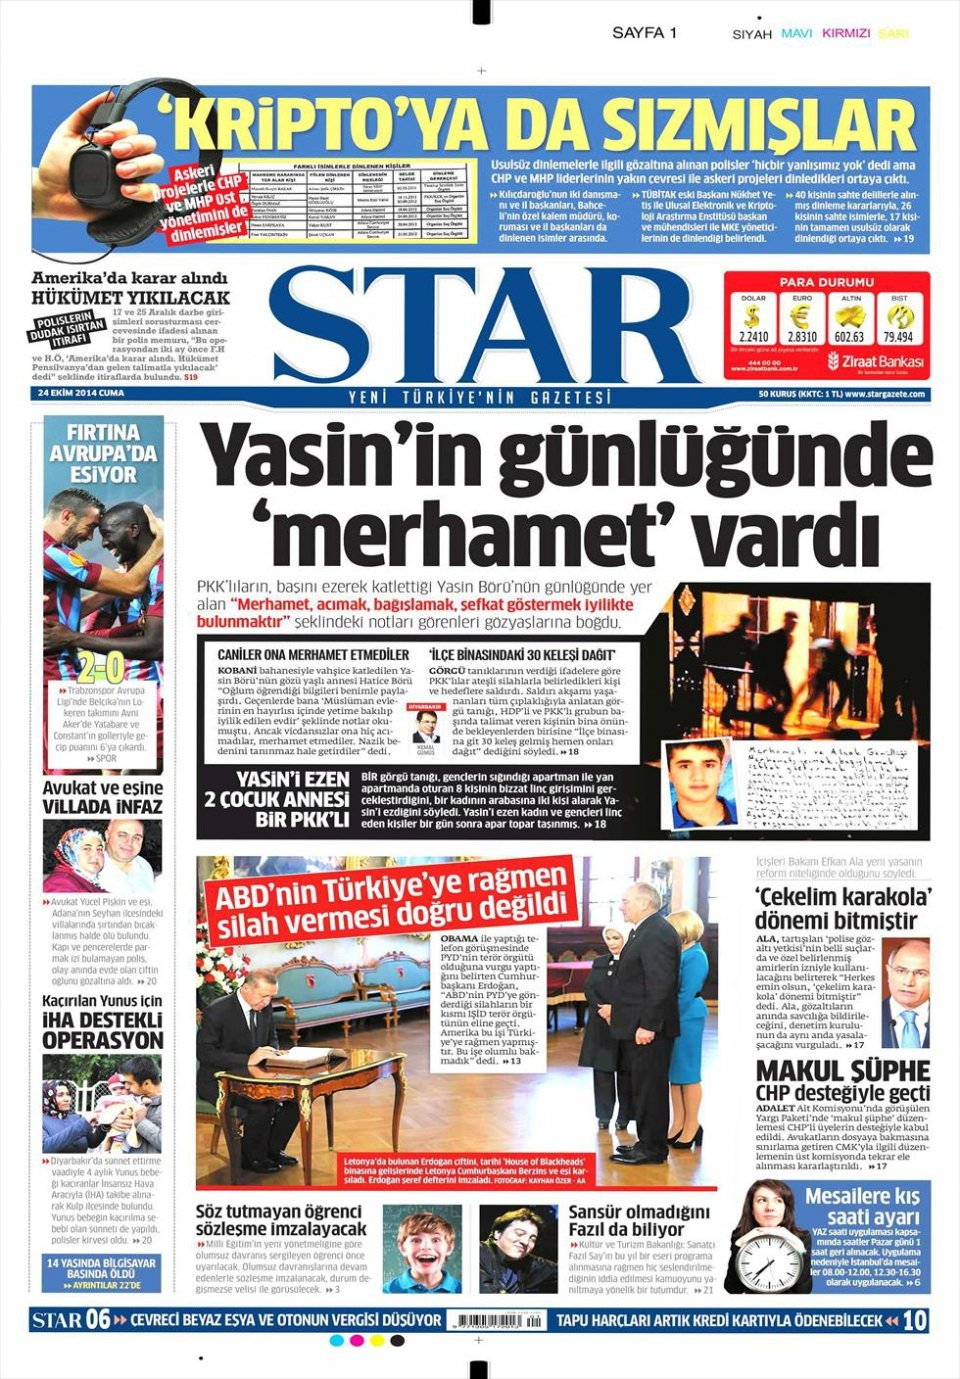 24 Ekim 2014 gazete manşetleri 17